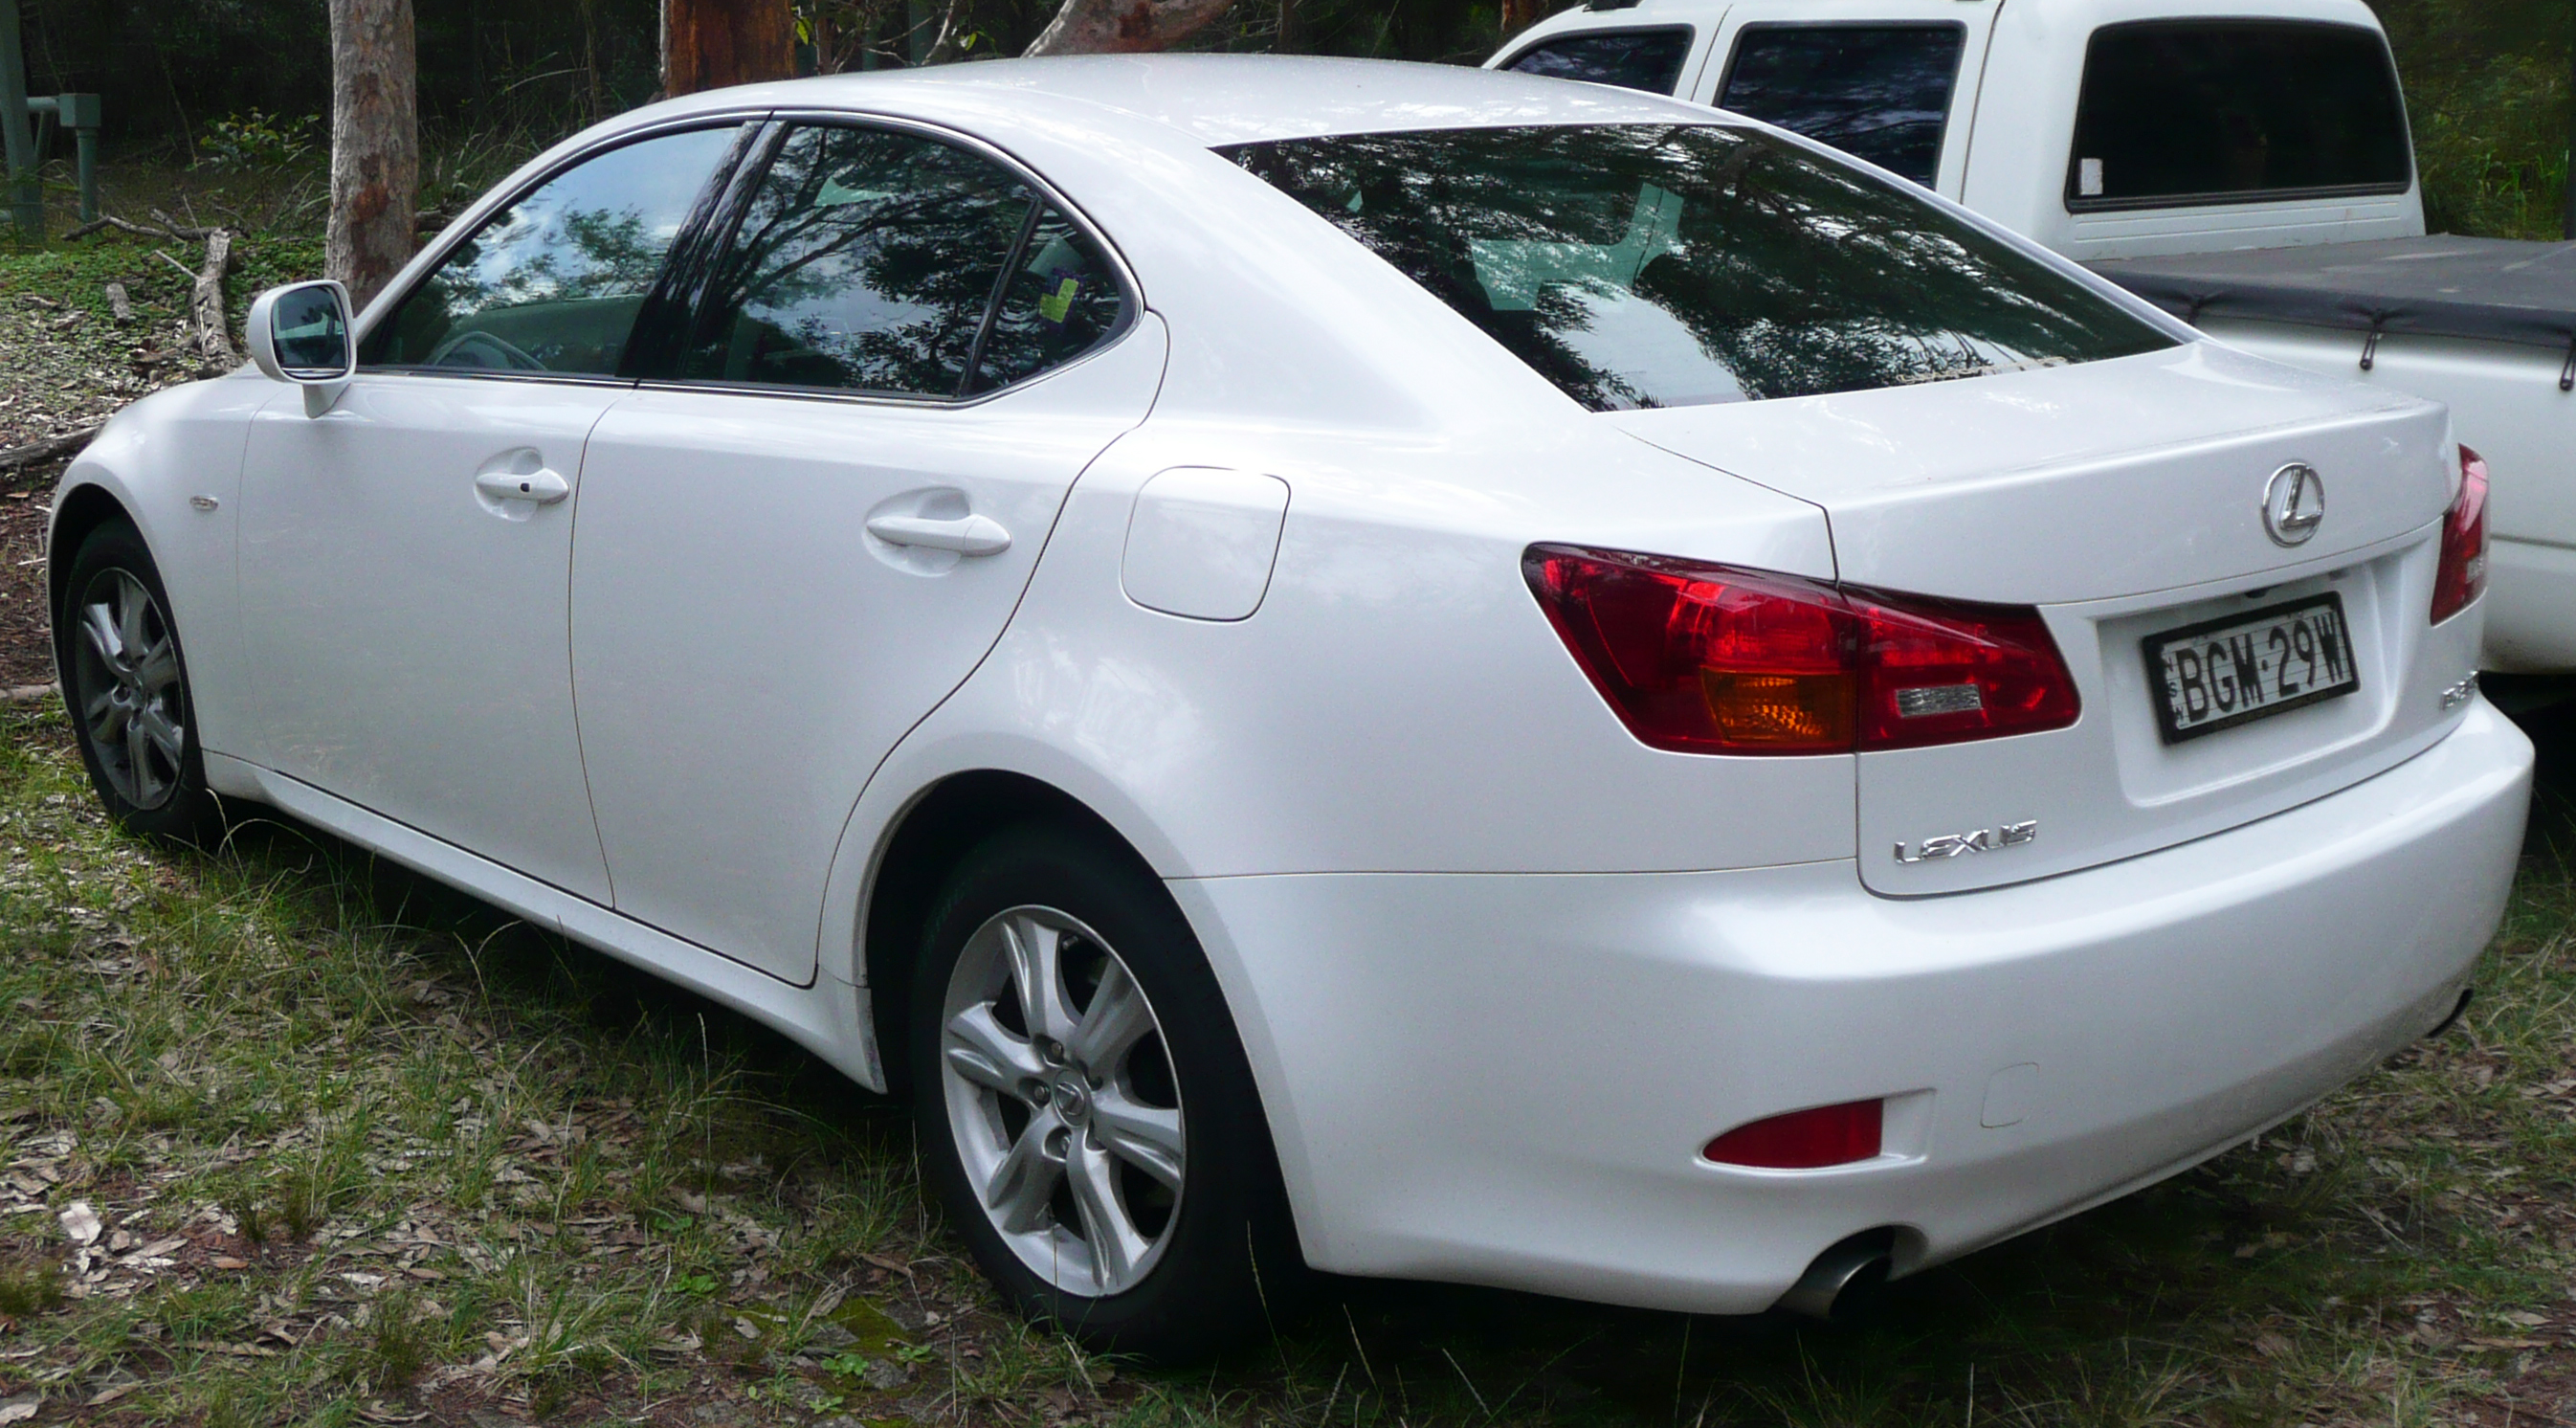 2008 Lexus Is 250 Image 1